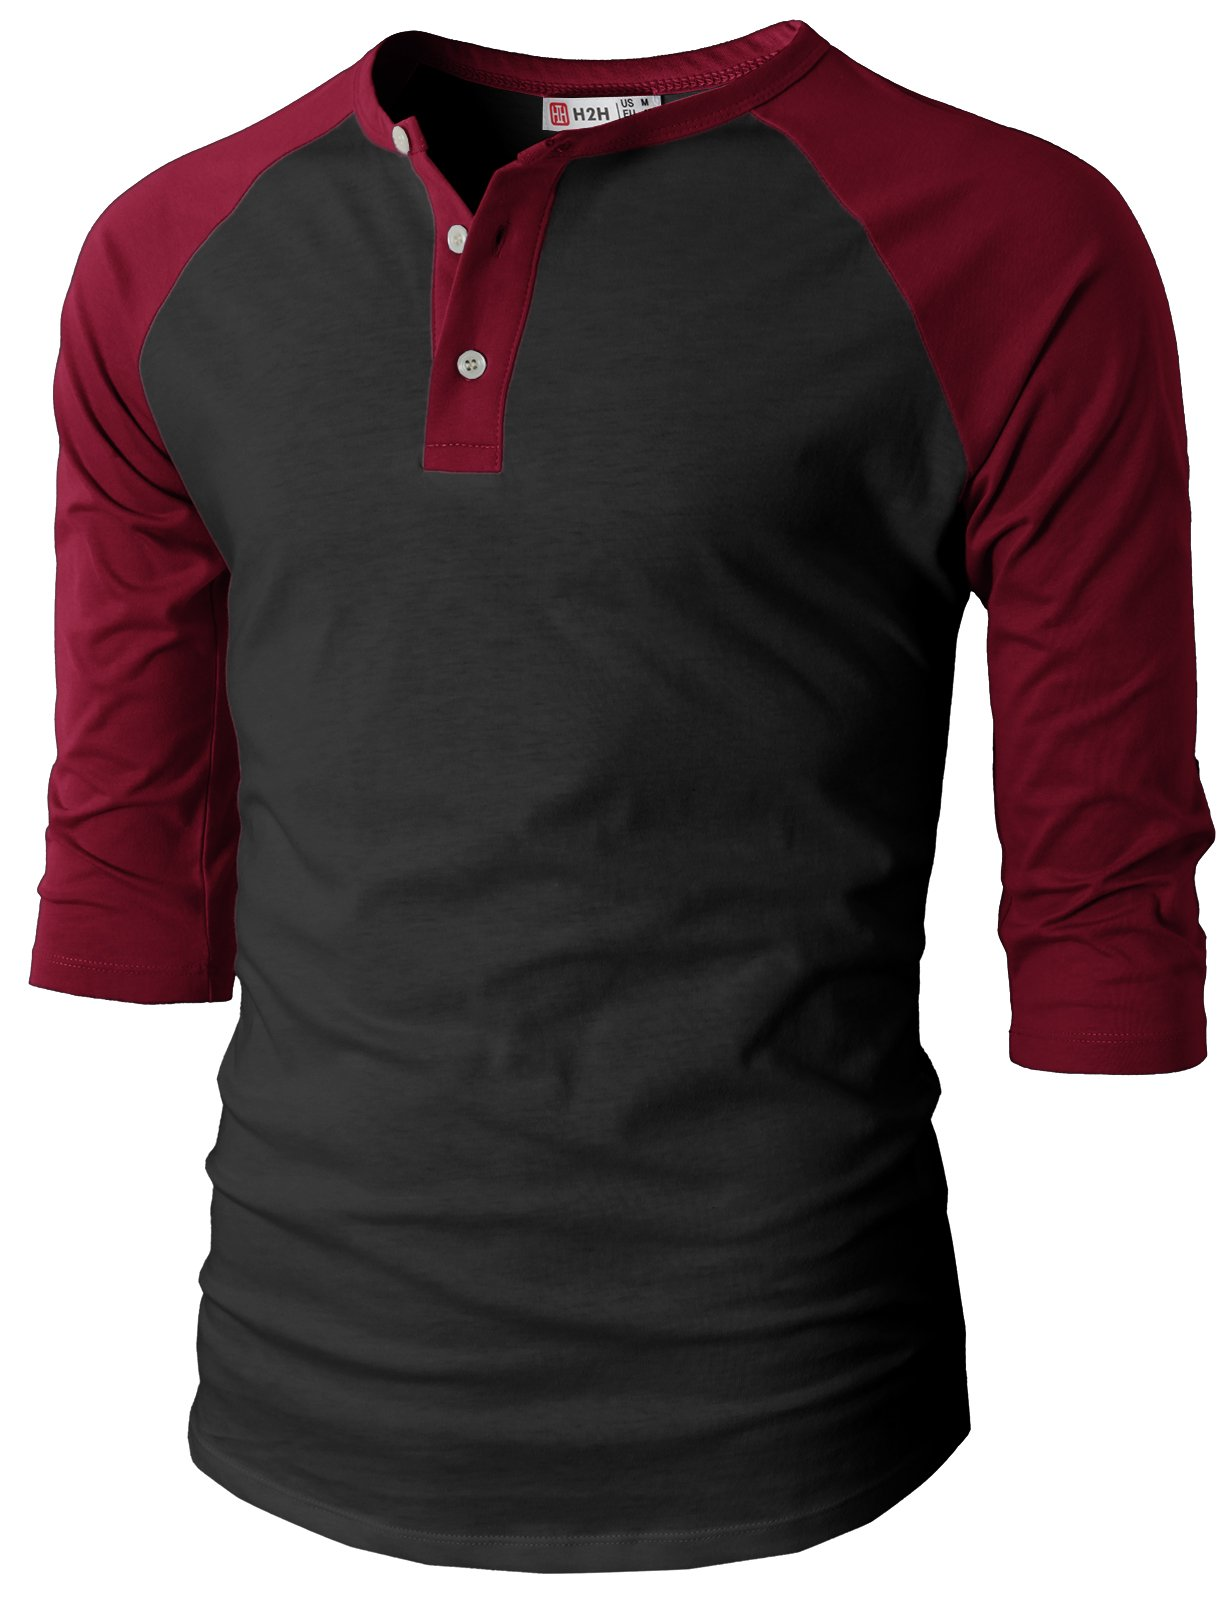 H2H Men Fashion Slim Fit Raglan Baseball 3/4 Sleeve Henley Premium T-Shirts BLACKWINE US L/Asia XL (CMTTS0174)